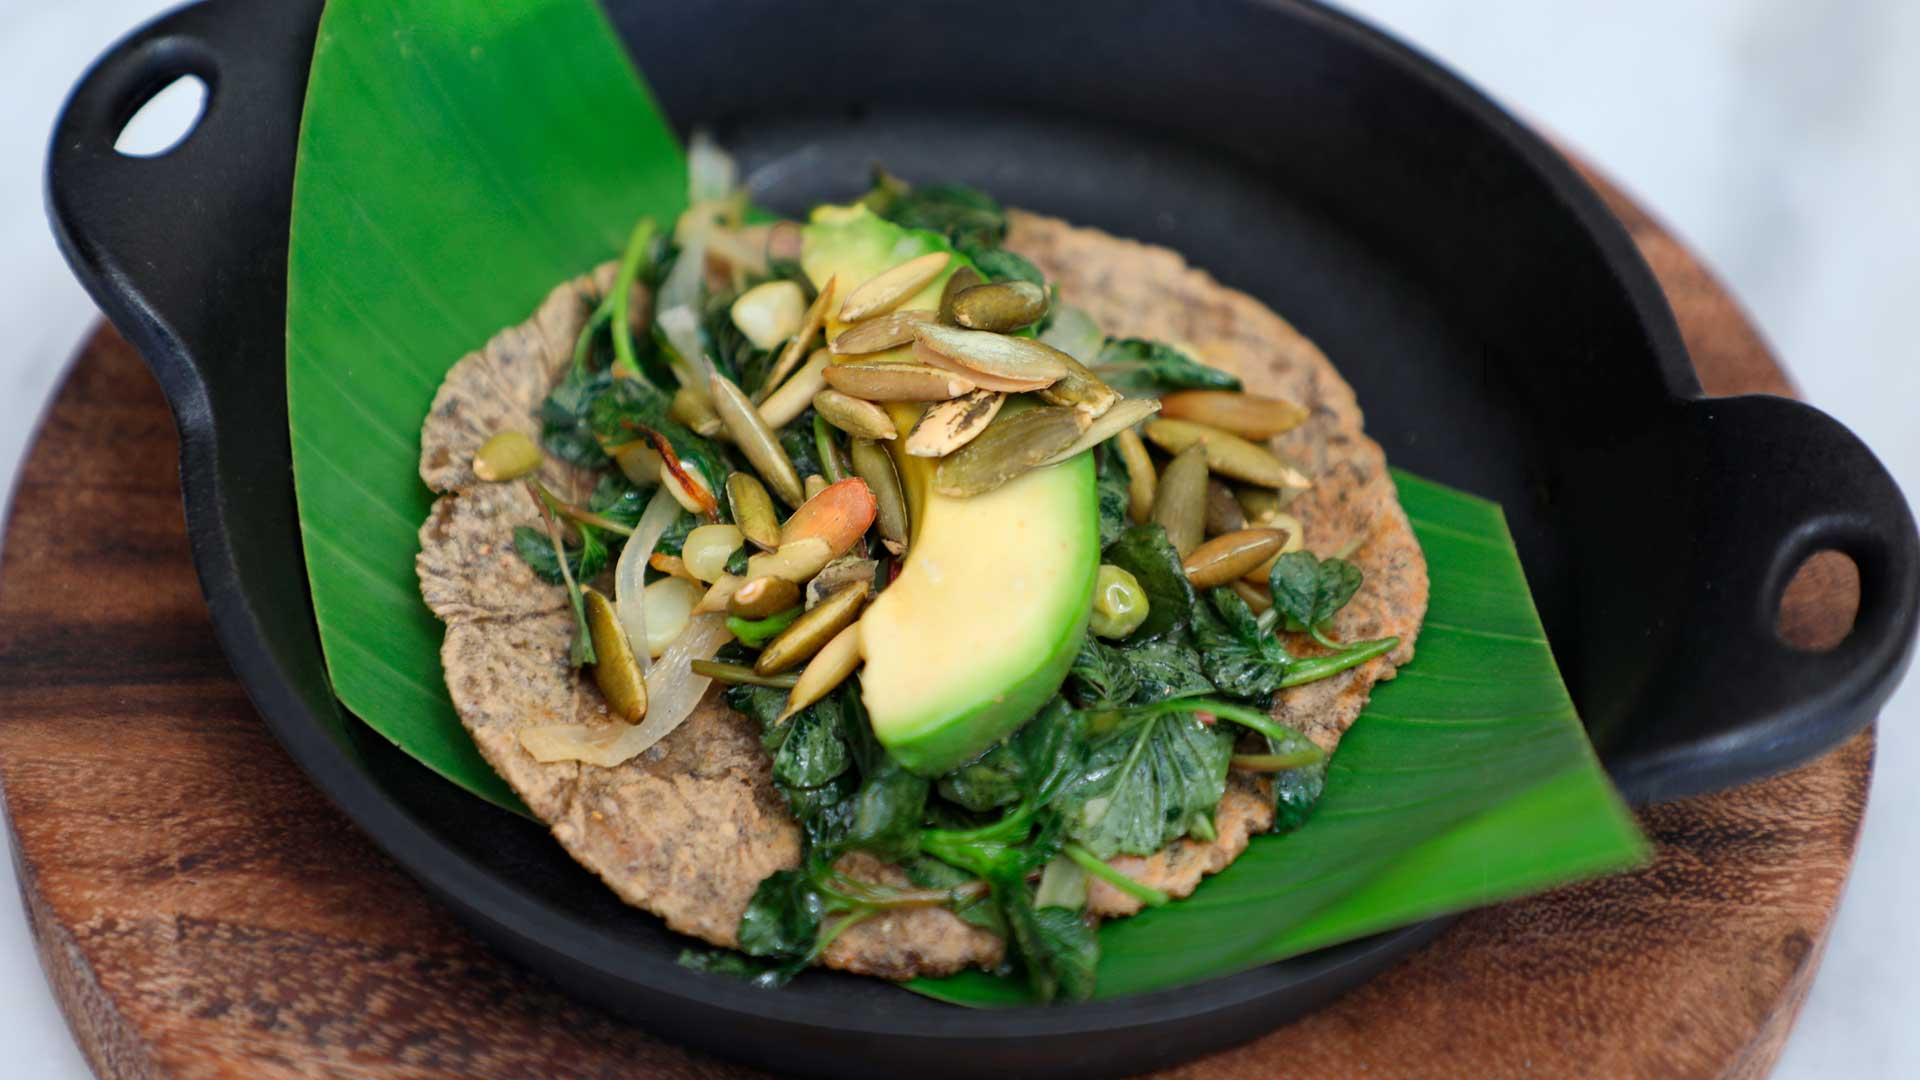 La cocina mexiquense del chef Pablo Salas llega a La Cantina Palacio